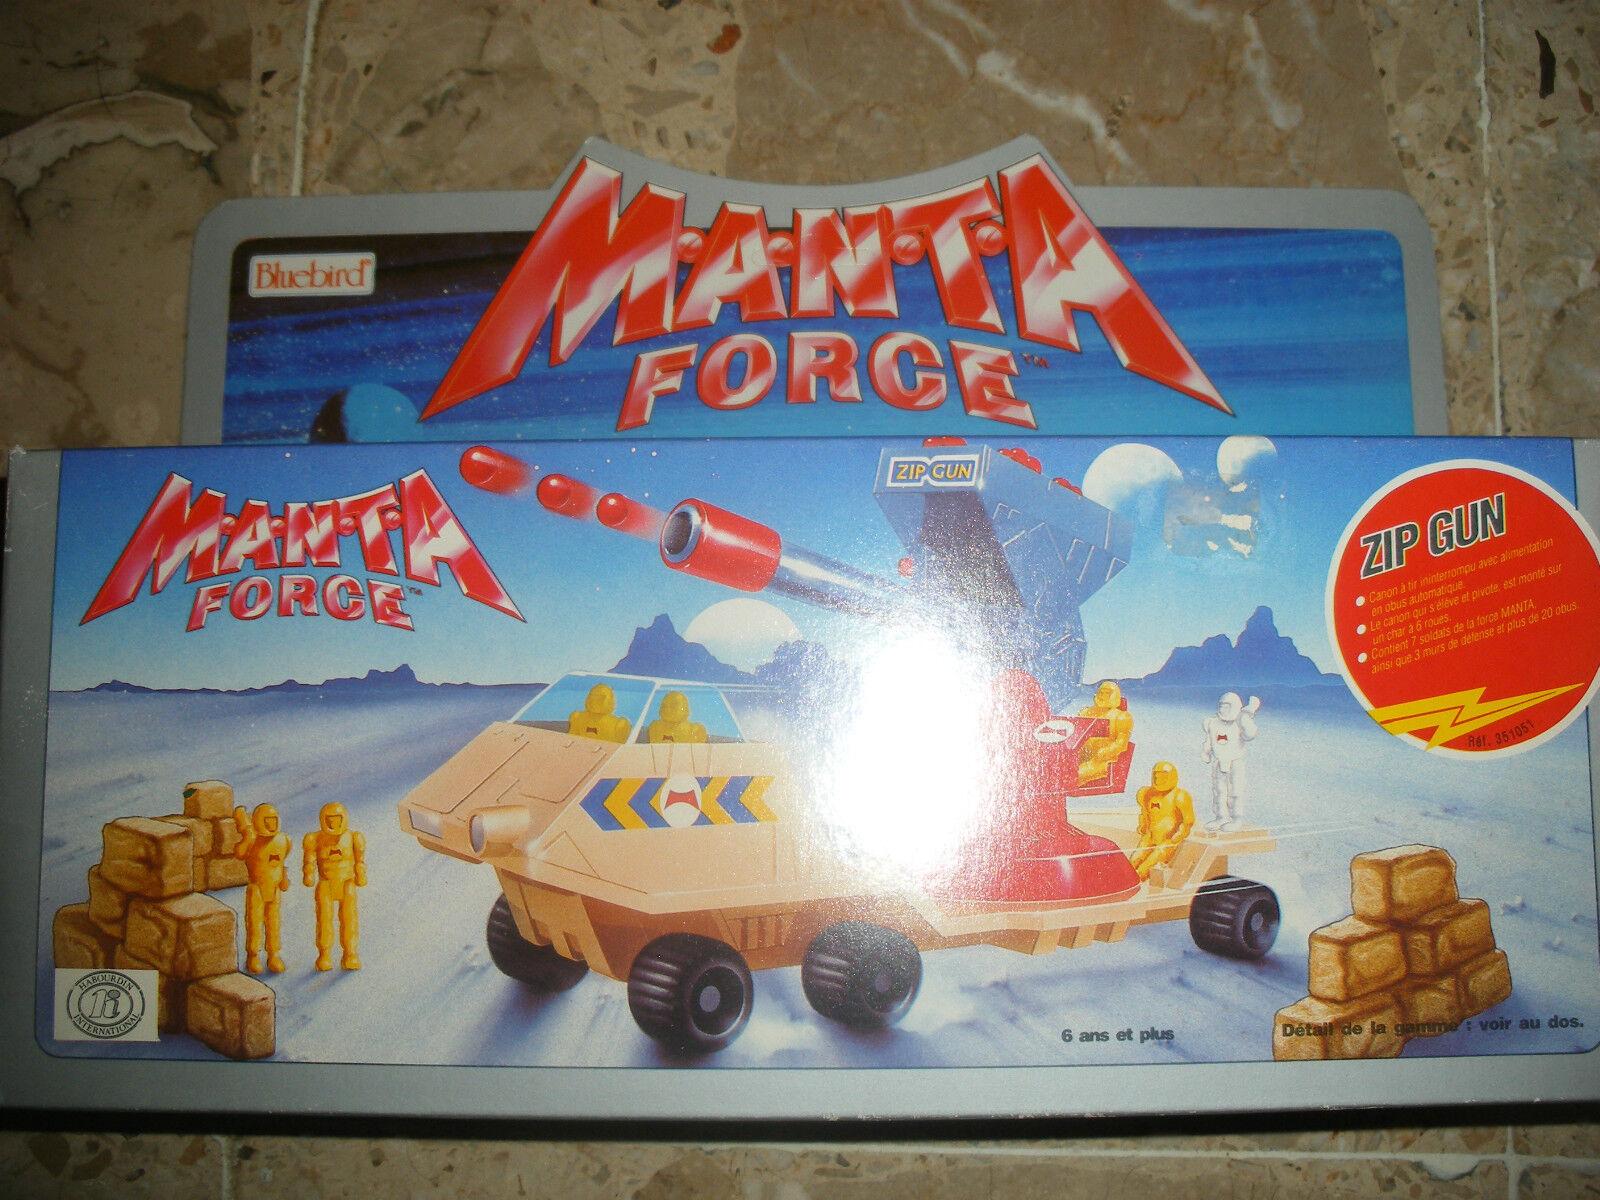 1988 blueebird MANTA FORCE FORCE FORCE Zip Gun  NEUF en boite NEW in Box MISB 78dae3